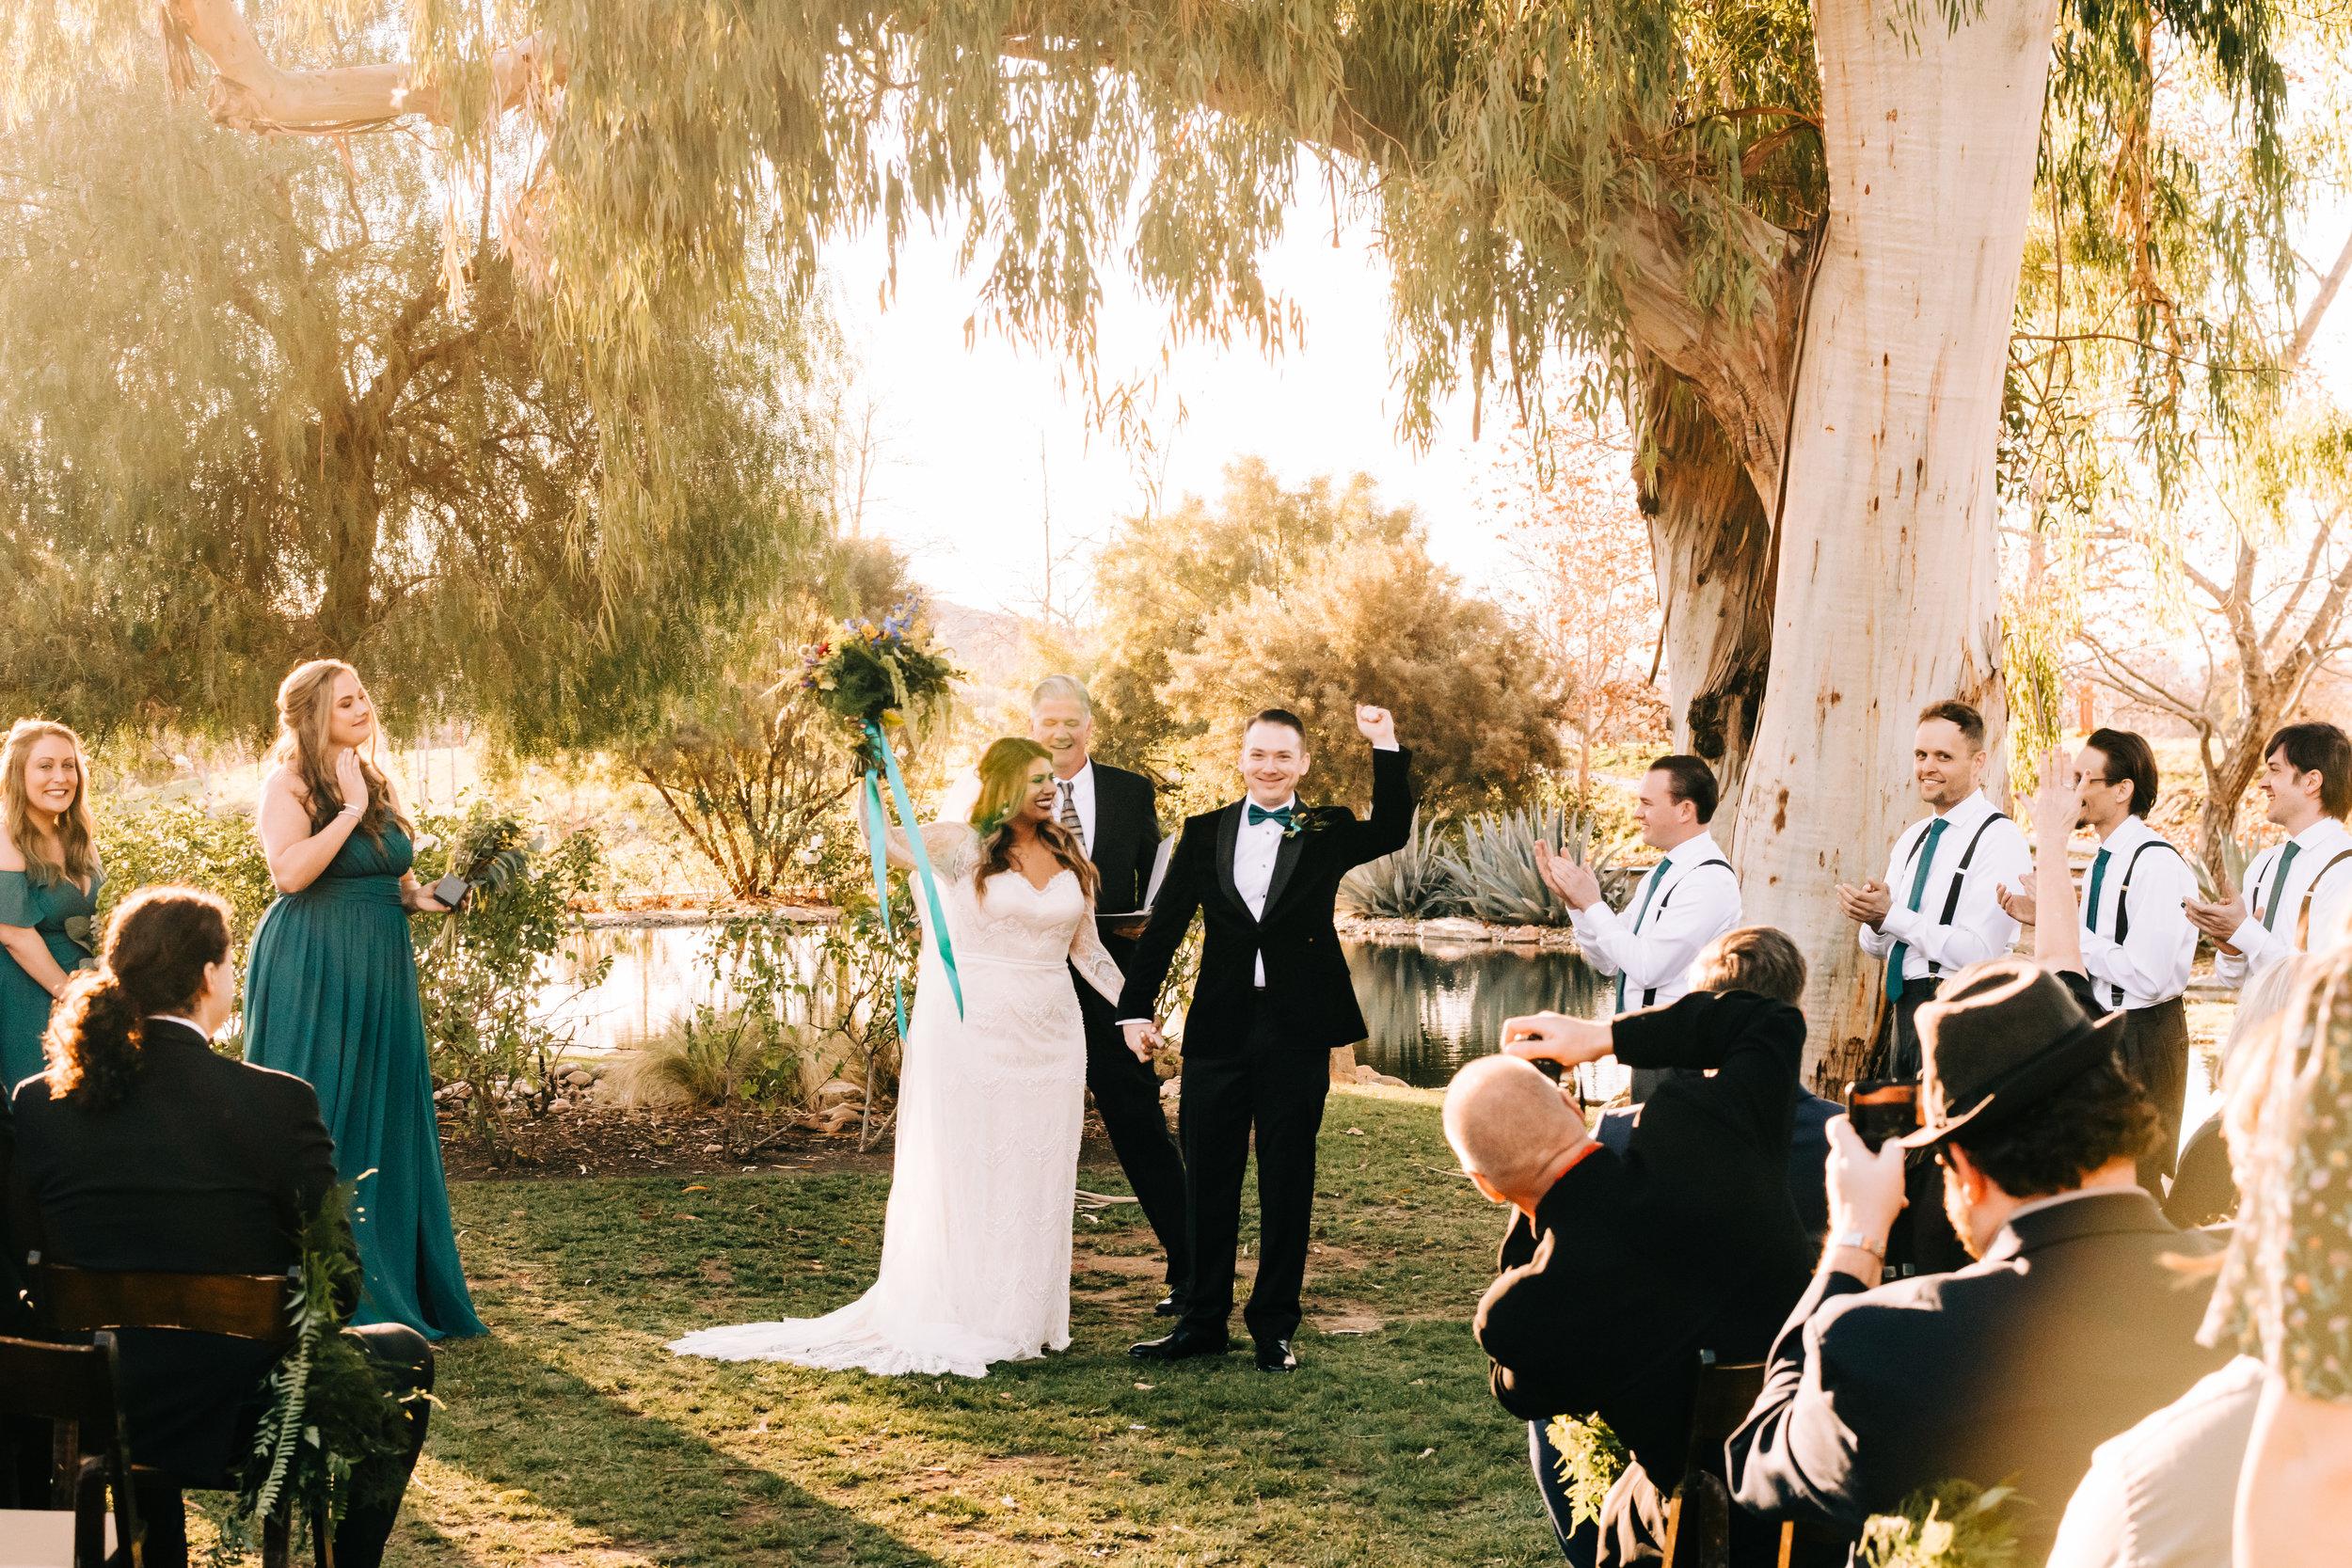 bay area nontraditional wedding photographer southern california boho wedding love light magic san francisco oakland northern california-615.jpg